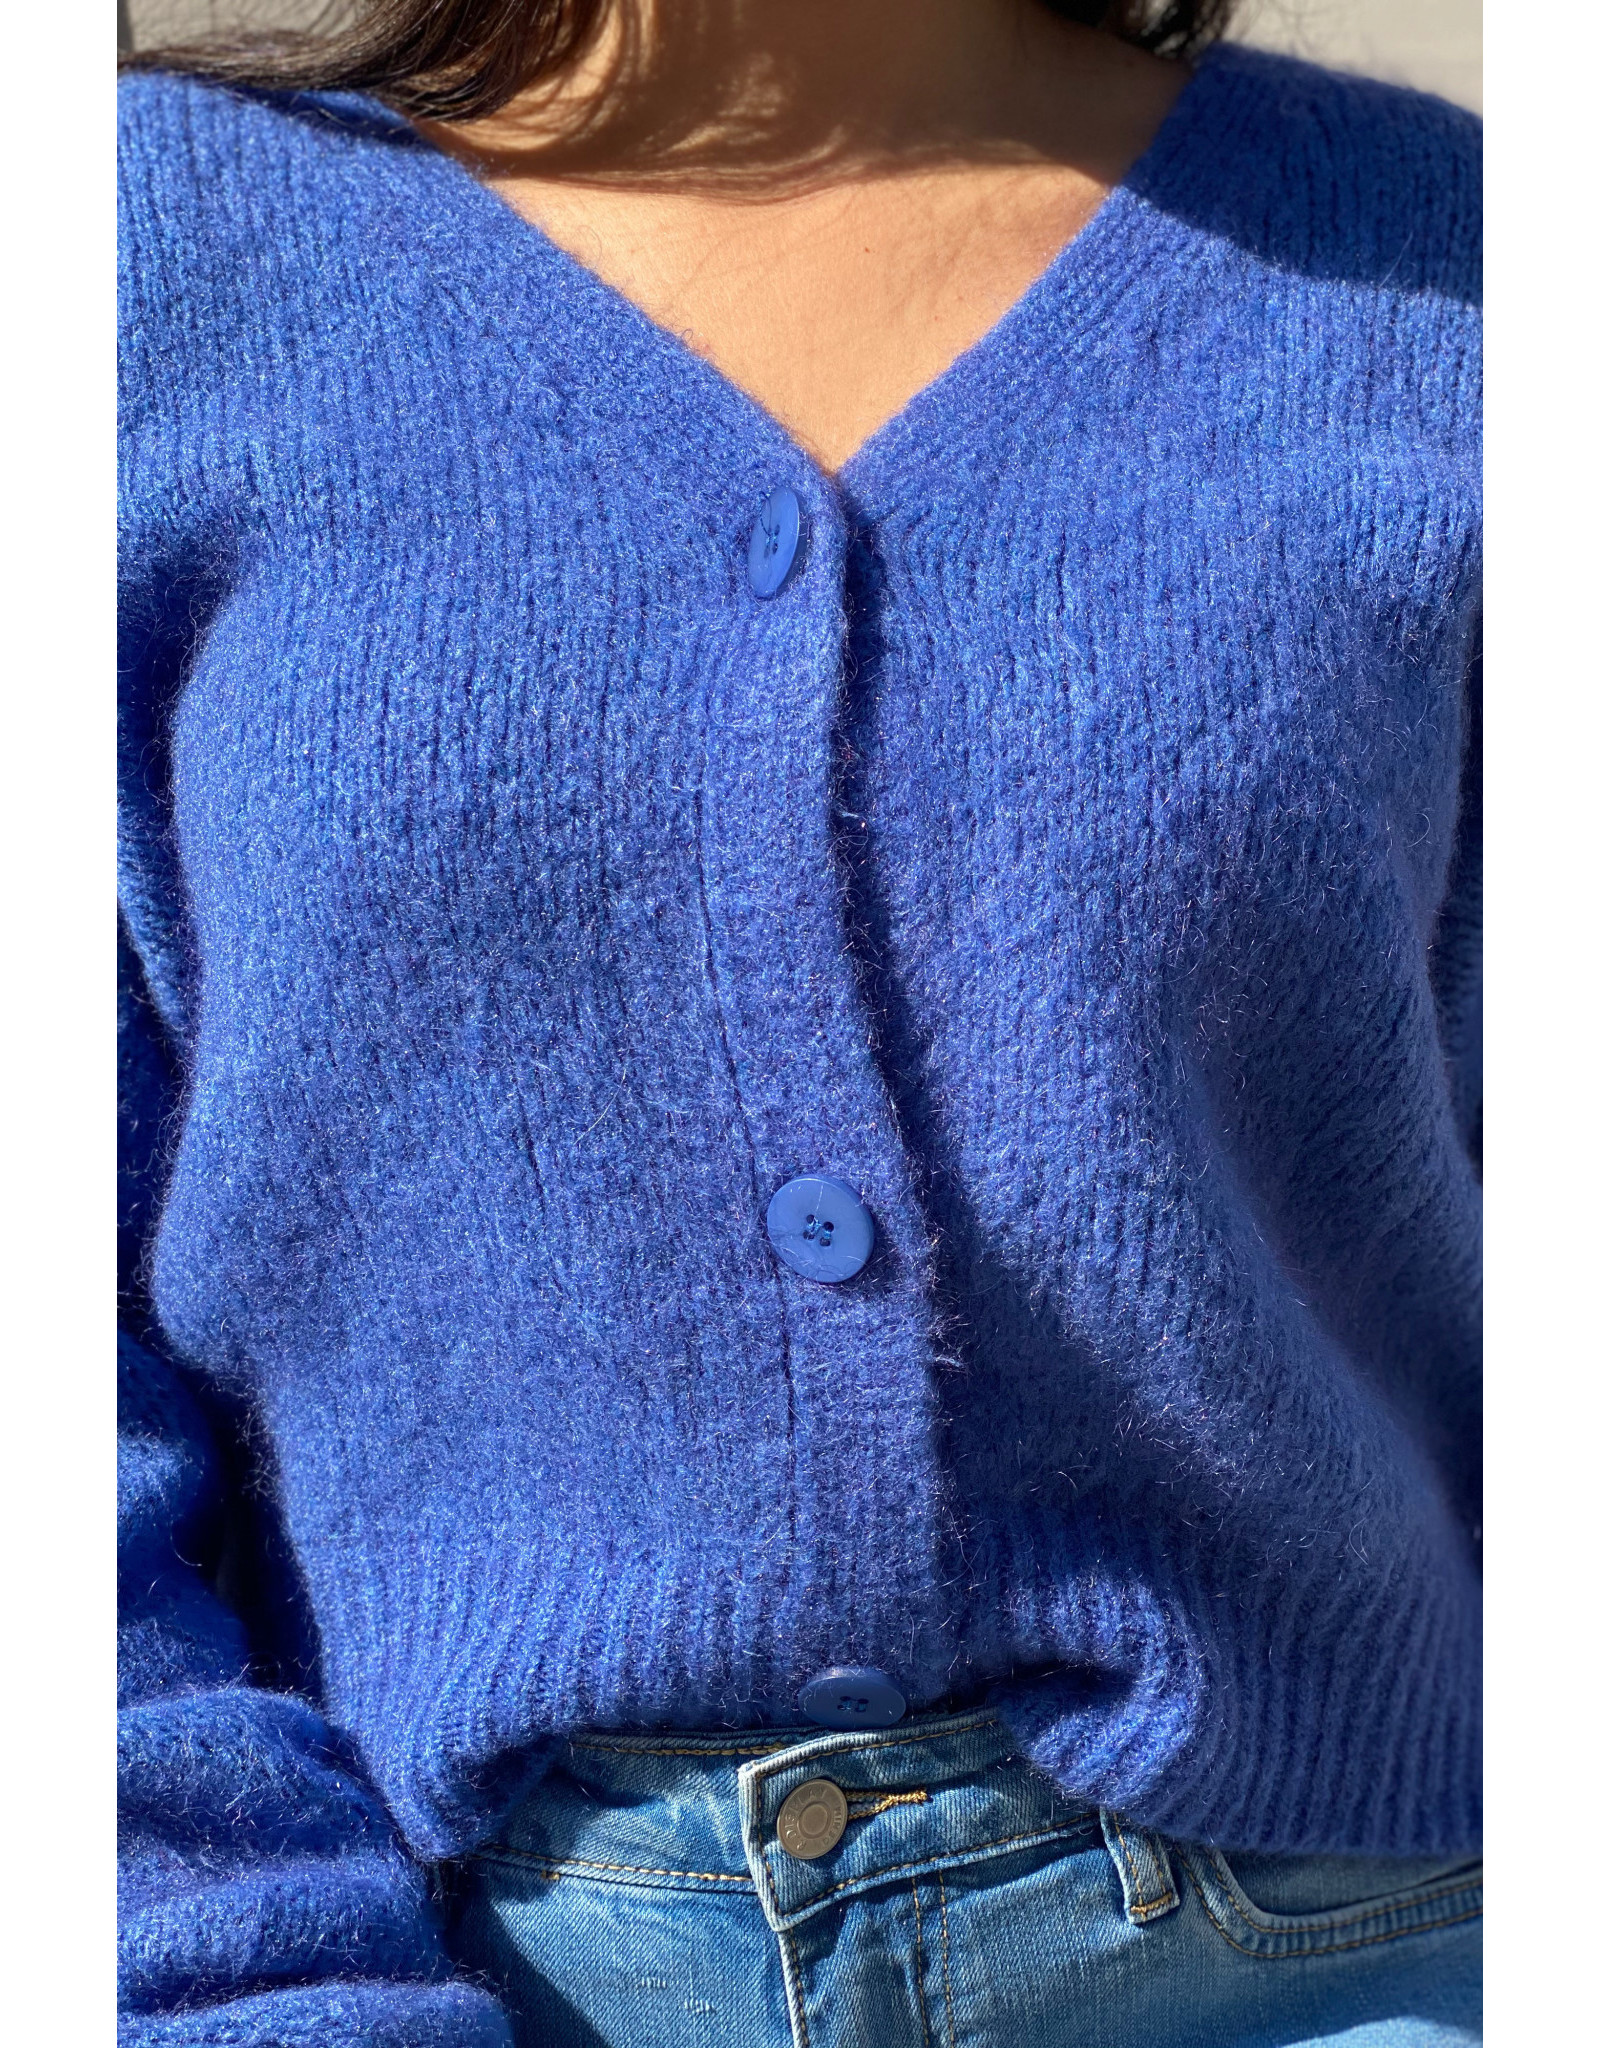 she's milano She's Milano x button cardigan cobalt blue